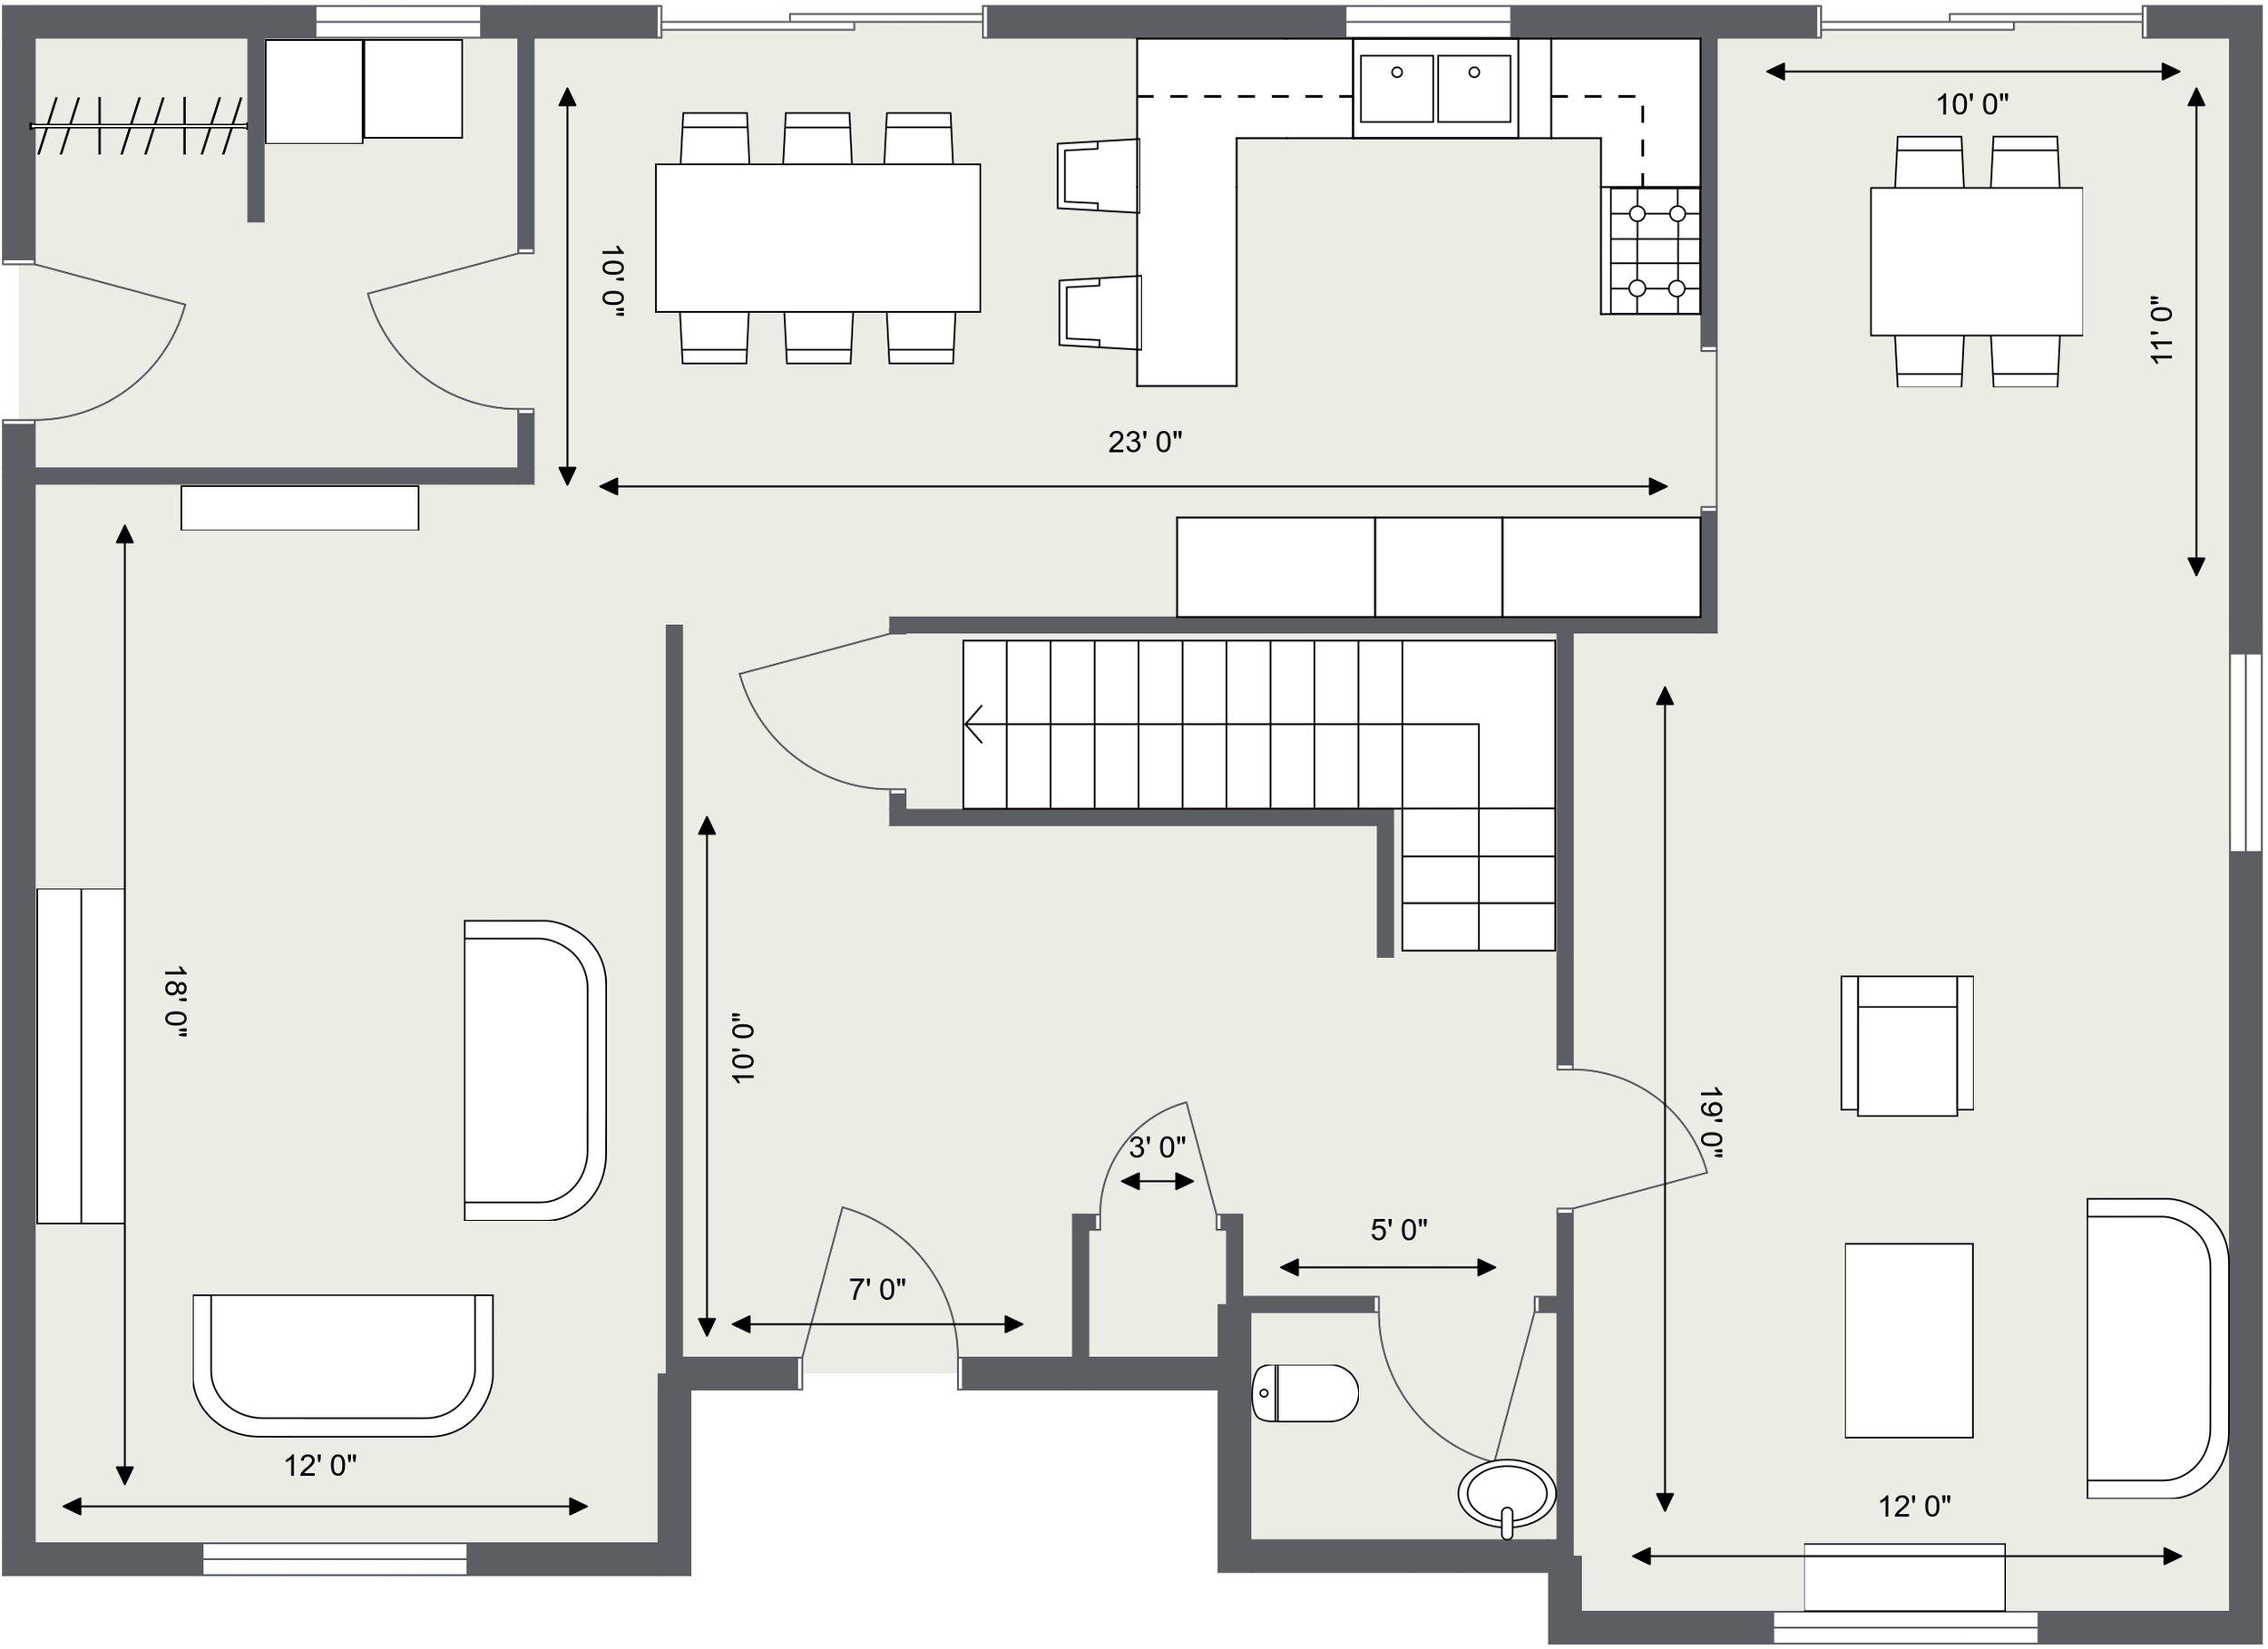 3080 South Street - 1. Floor - 2D Floor Plan.jpg